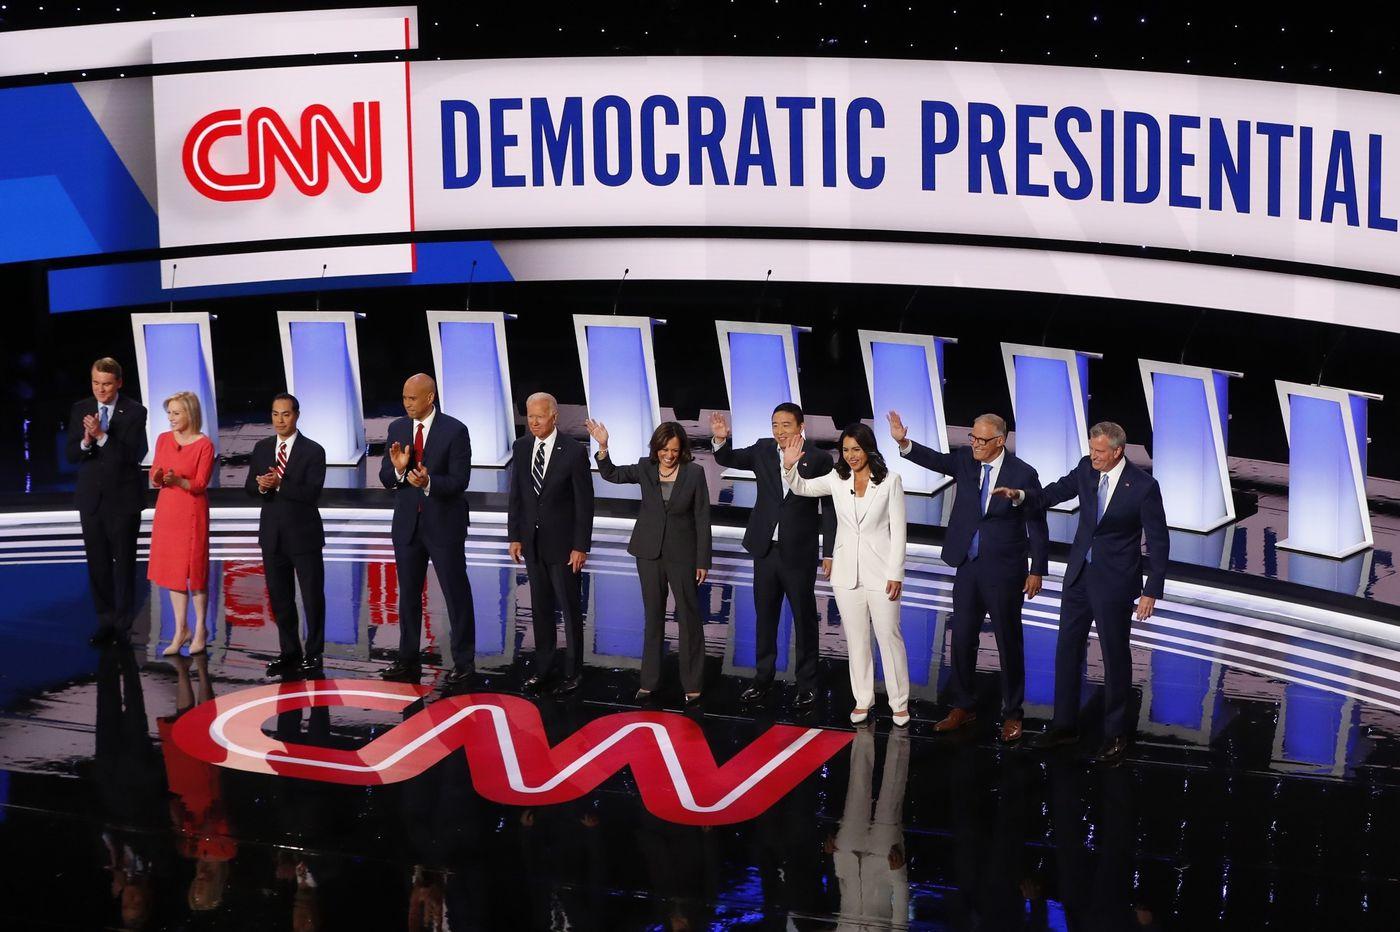 Biden's response to Trump, Warren scrutiny, and Tom Steyer's debut: What to watch for in tonight's Democratic debate